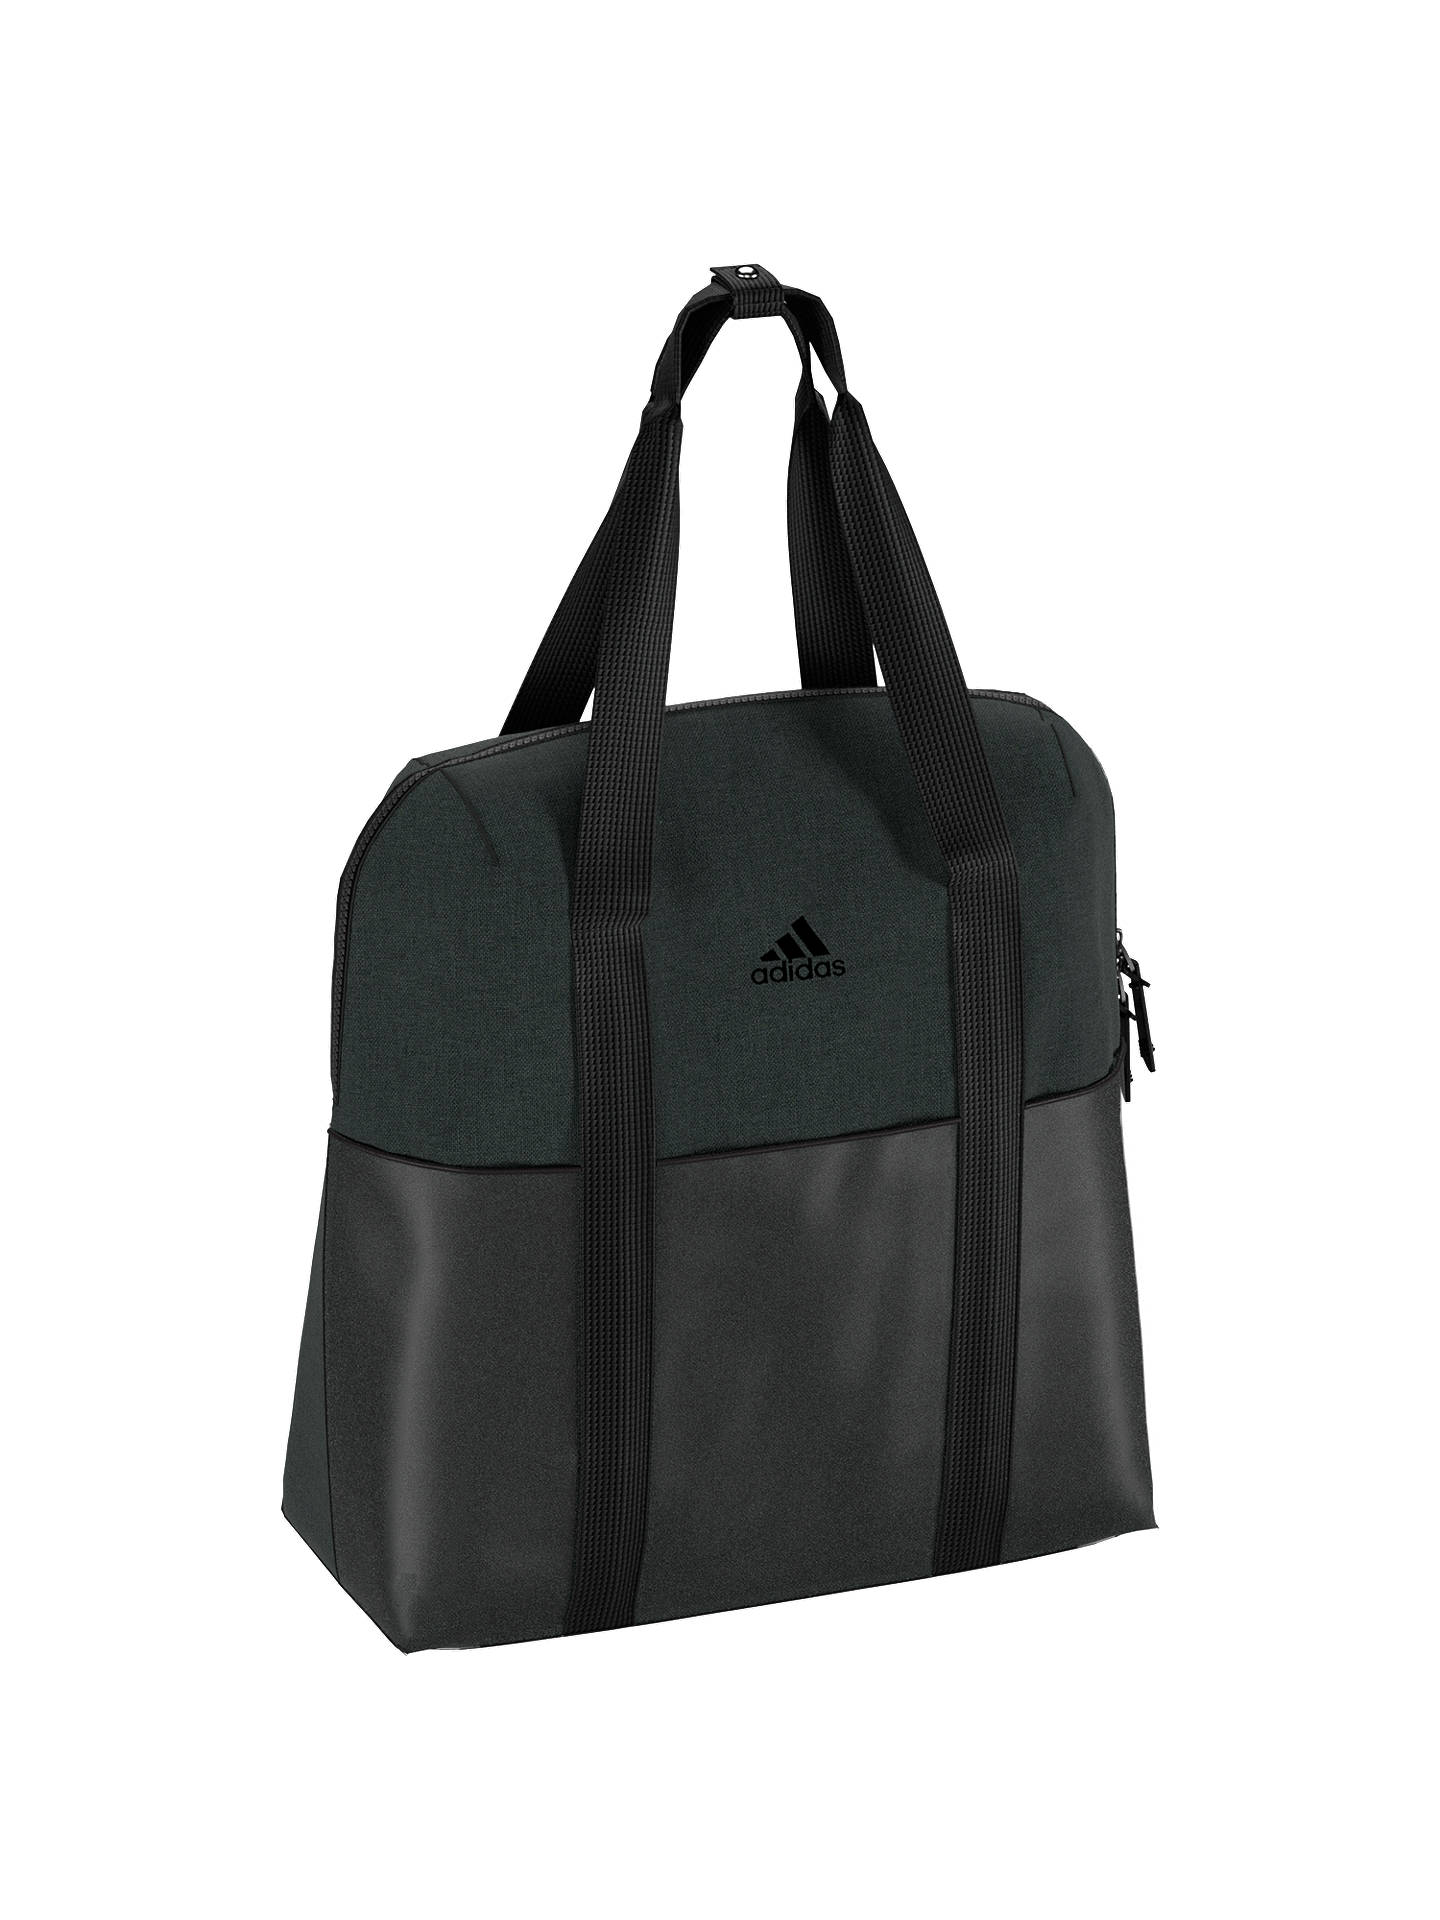 515435f2a5 Buy adidas ID Tote Bag